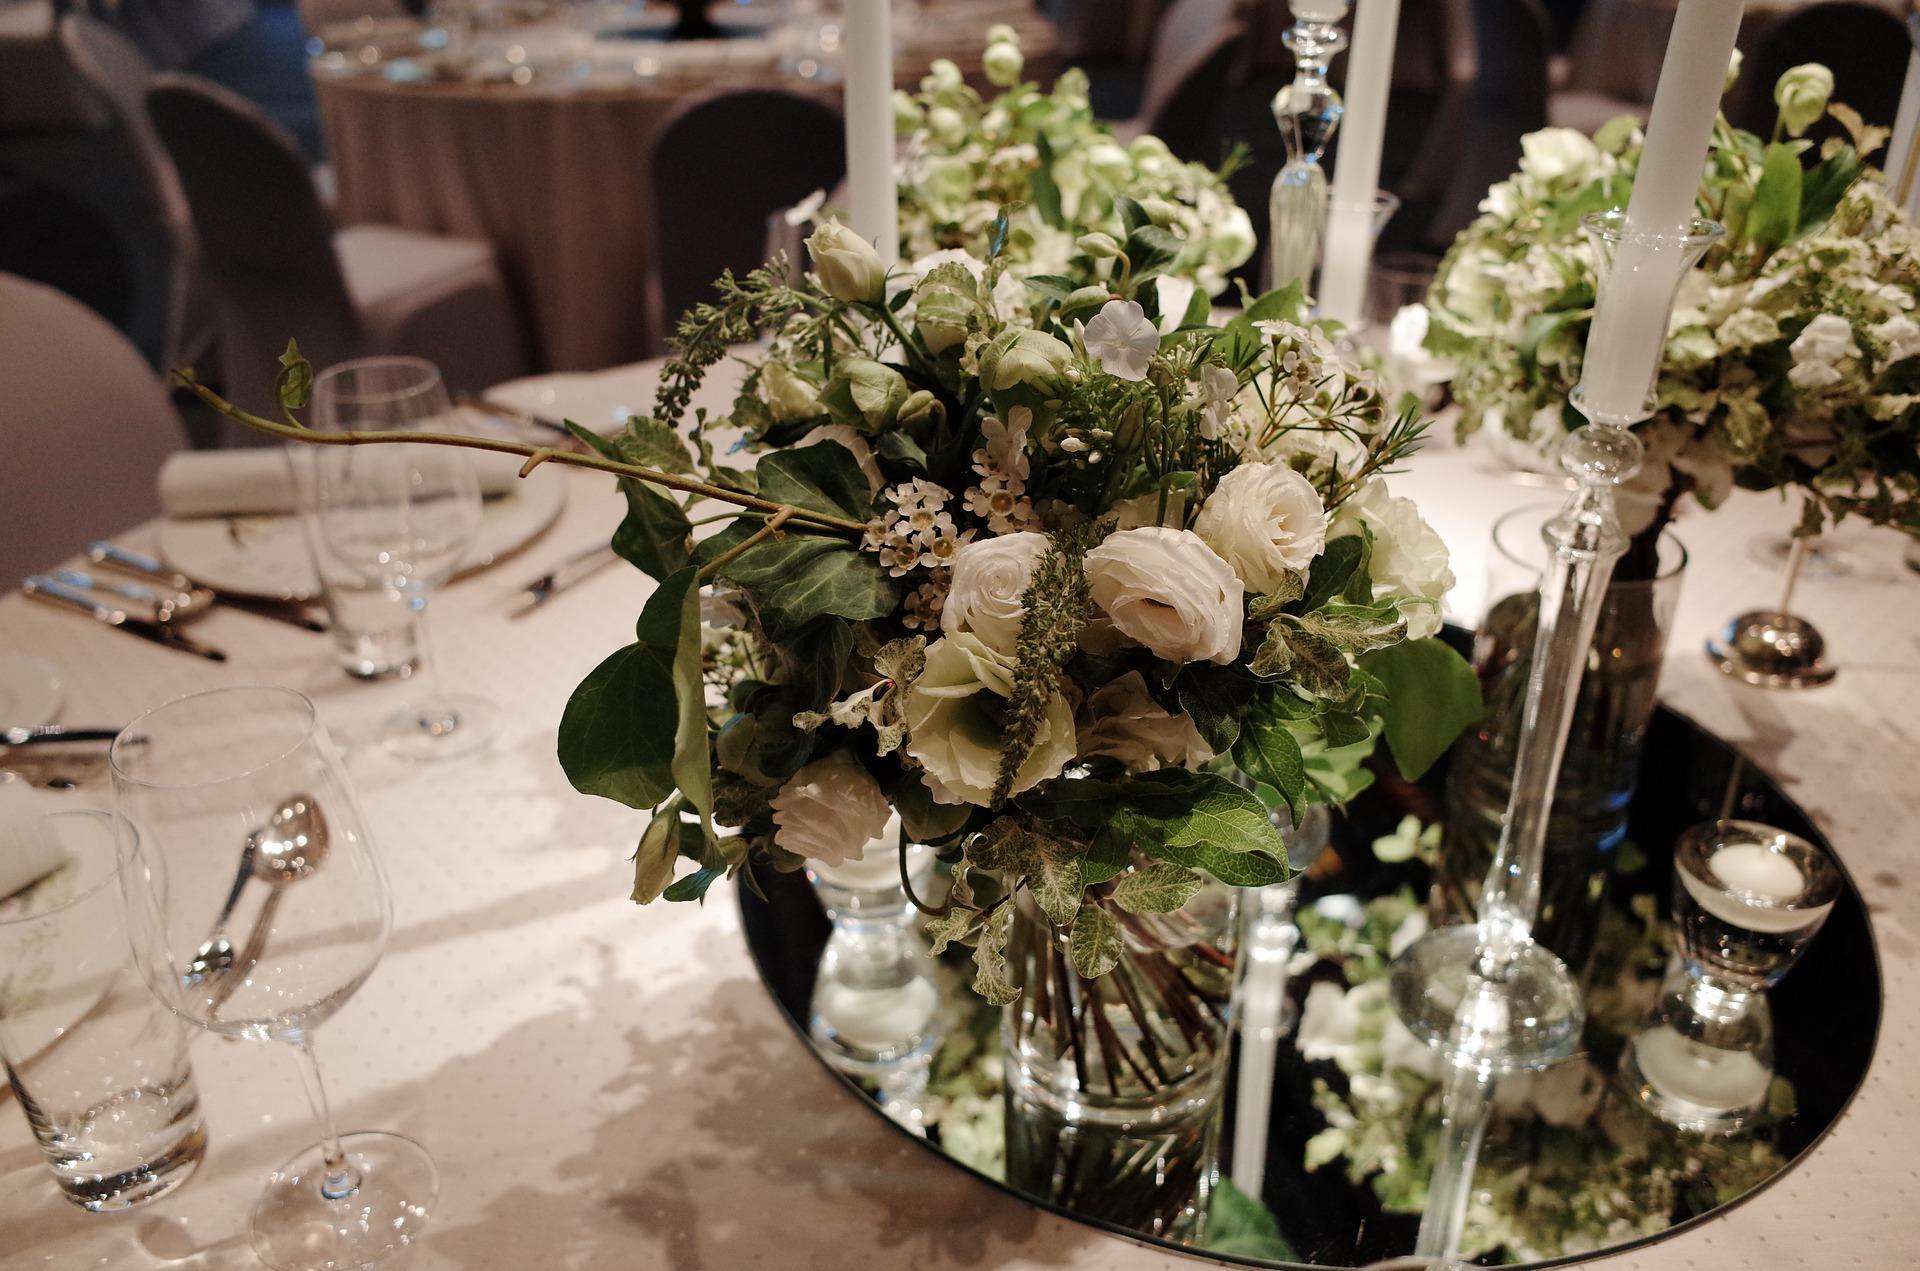 florist-4569127_1920